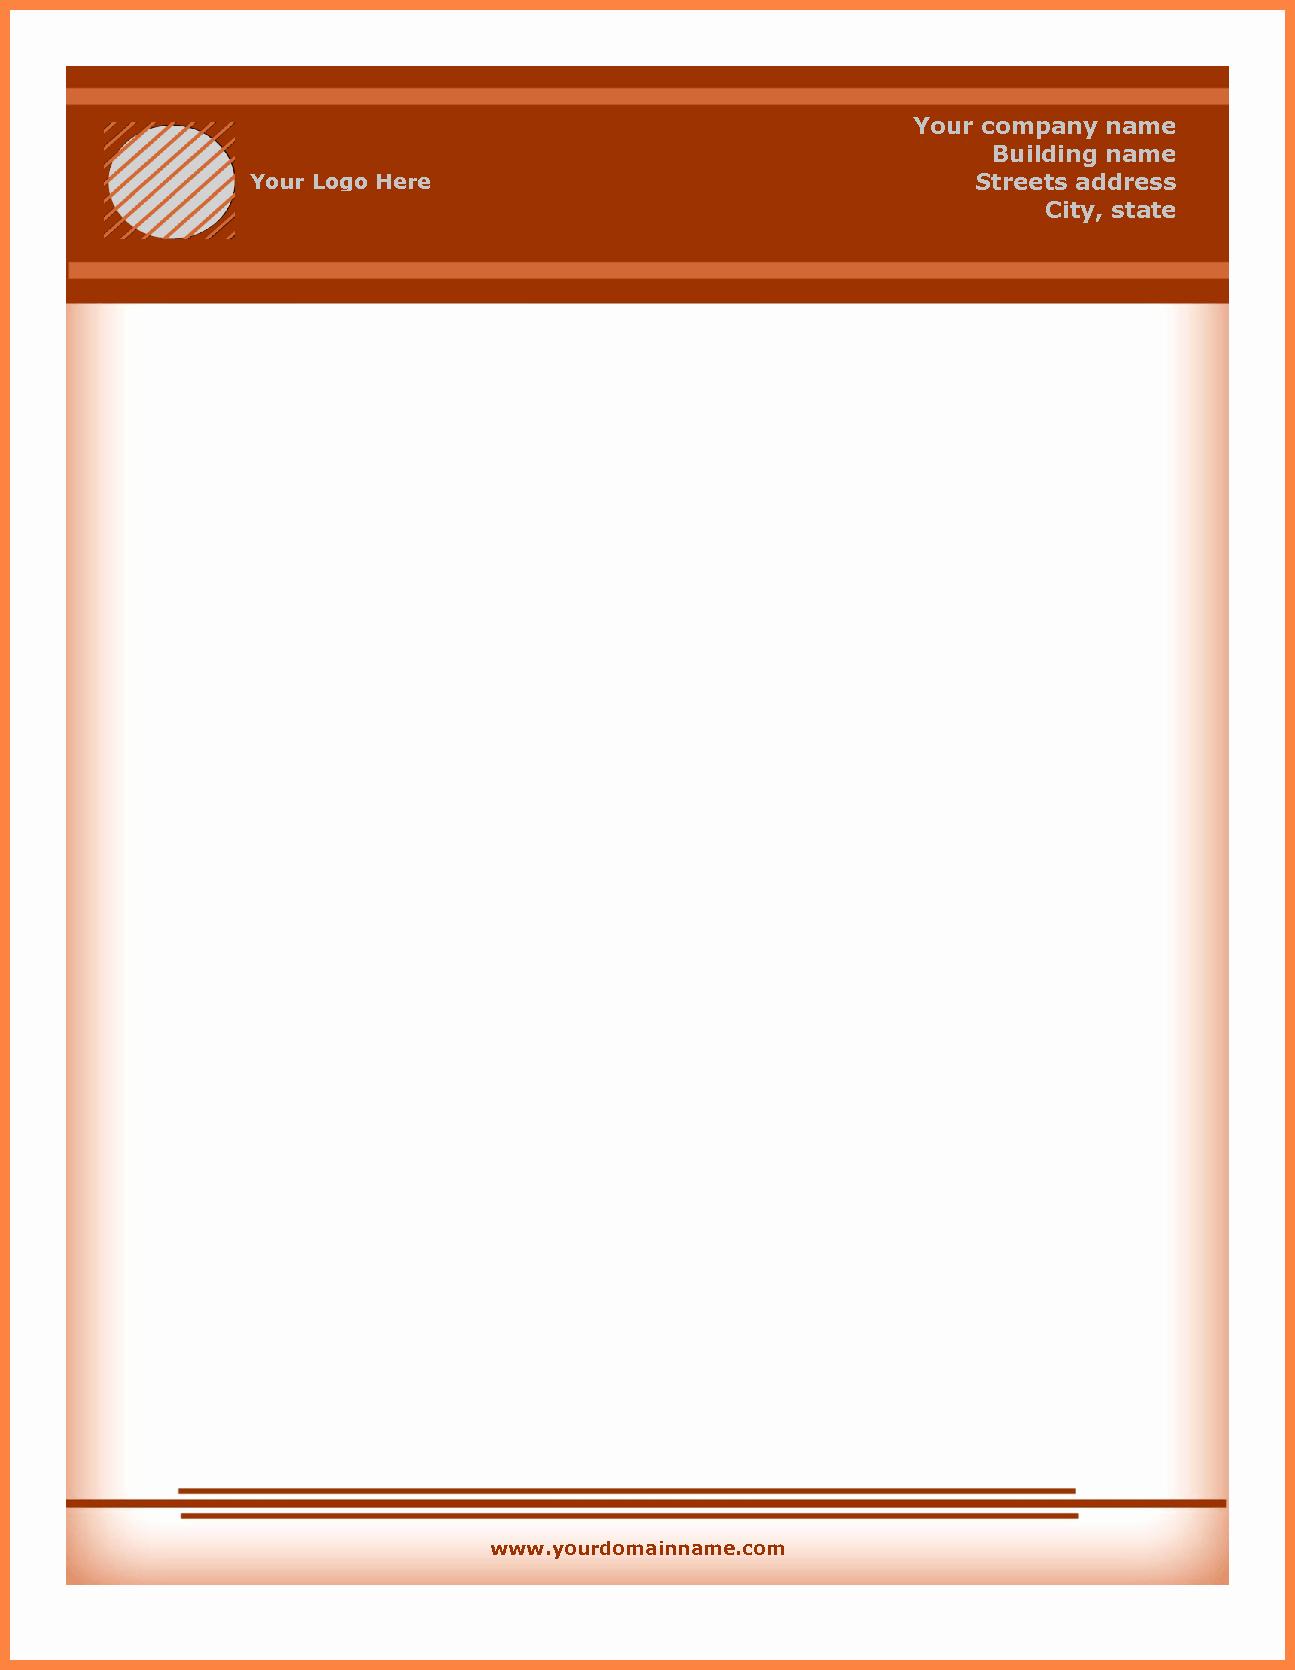 Microsoft Word Letterhead Template Free